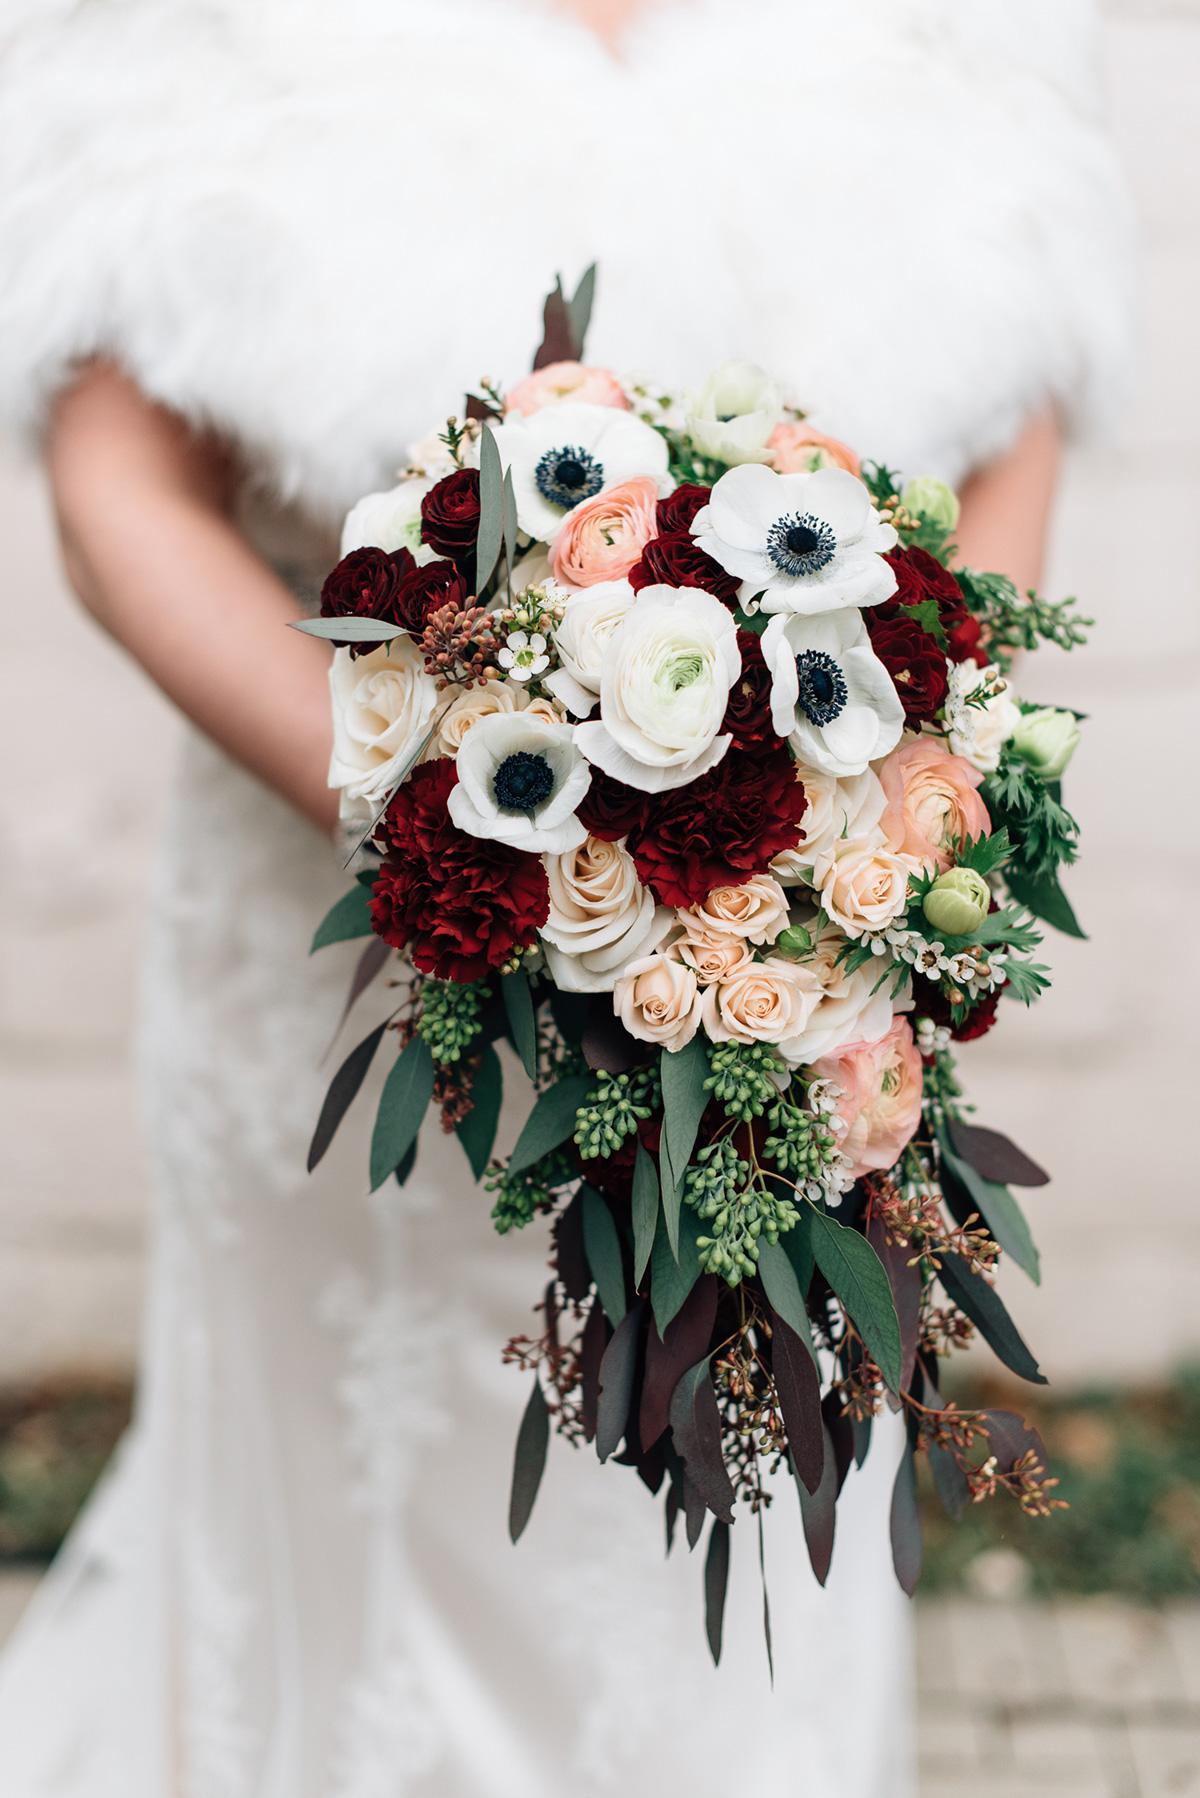 sara-wilde-photography-vineyard-bride-swish-list-inn-on-the-twenty-jordan-wedding-19.jpg